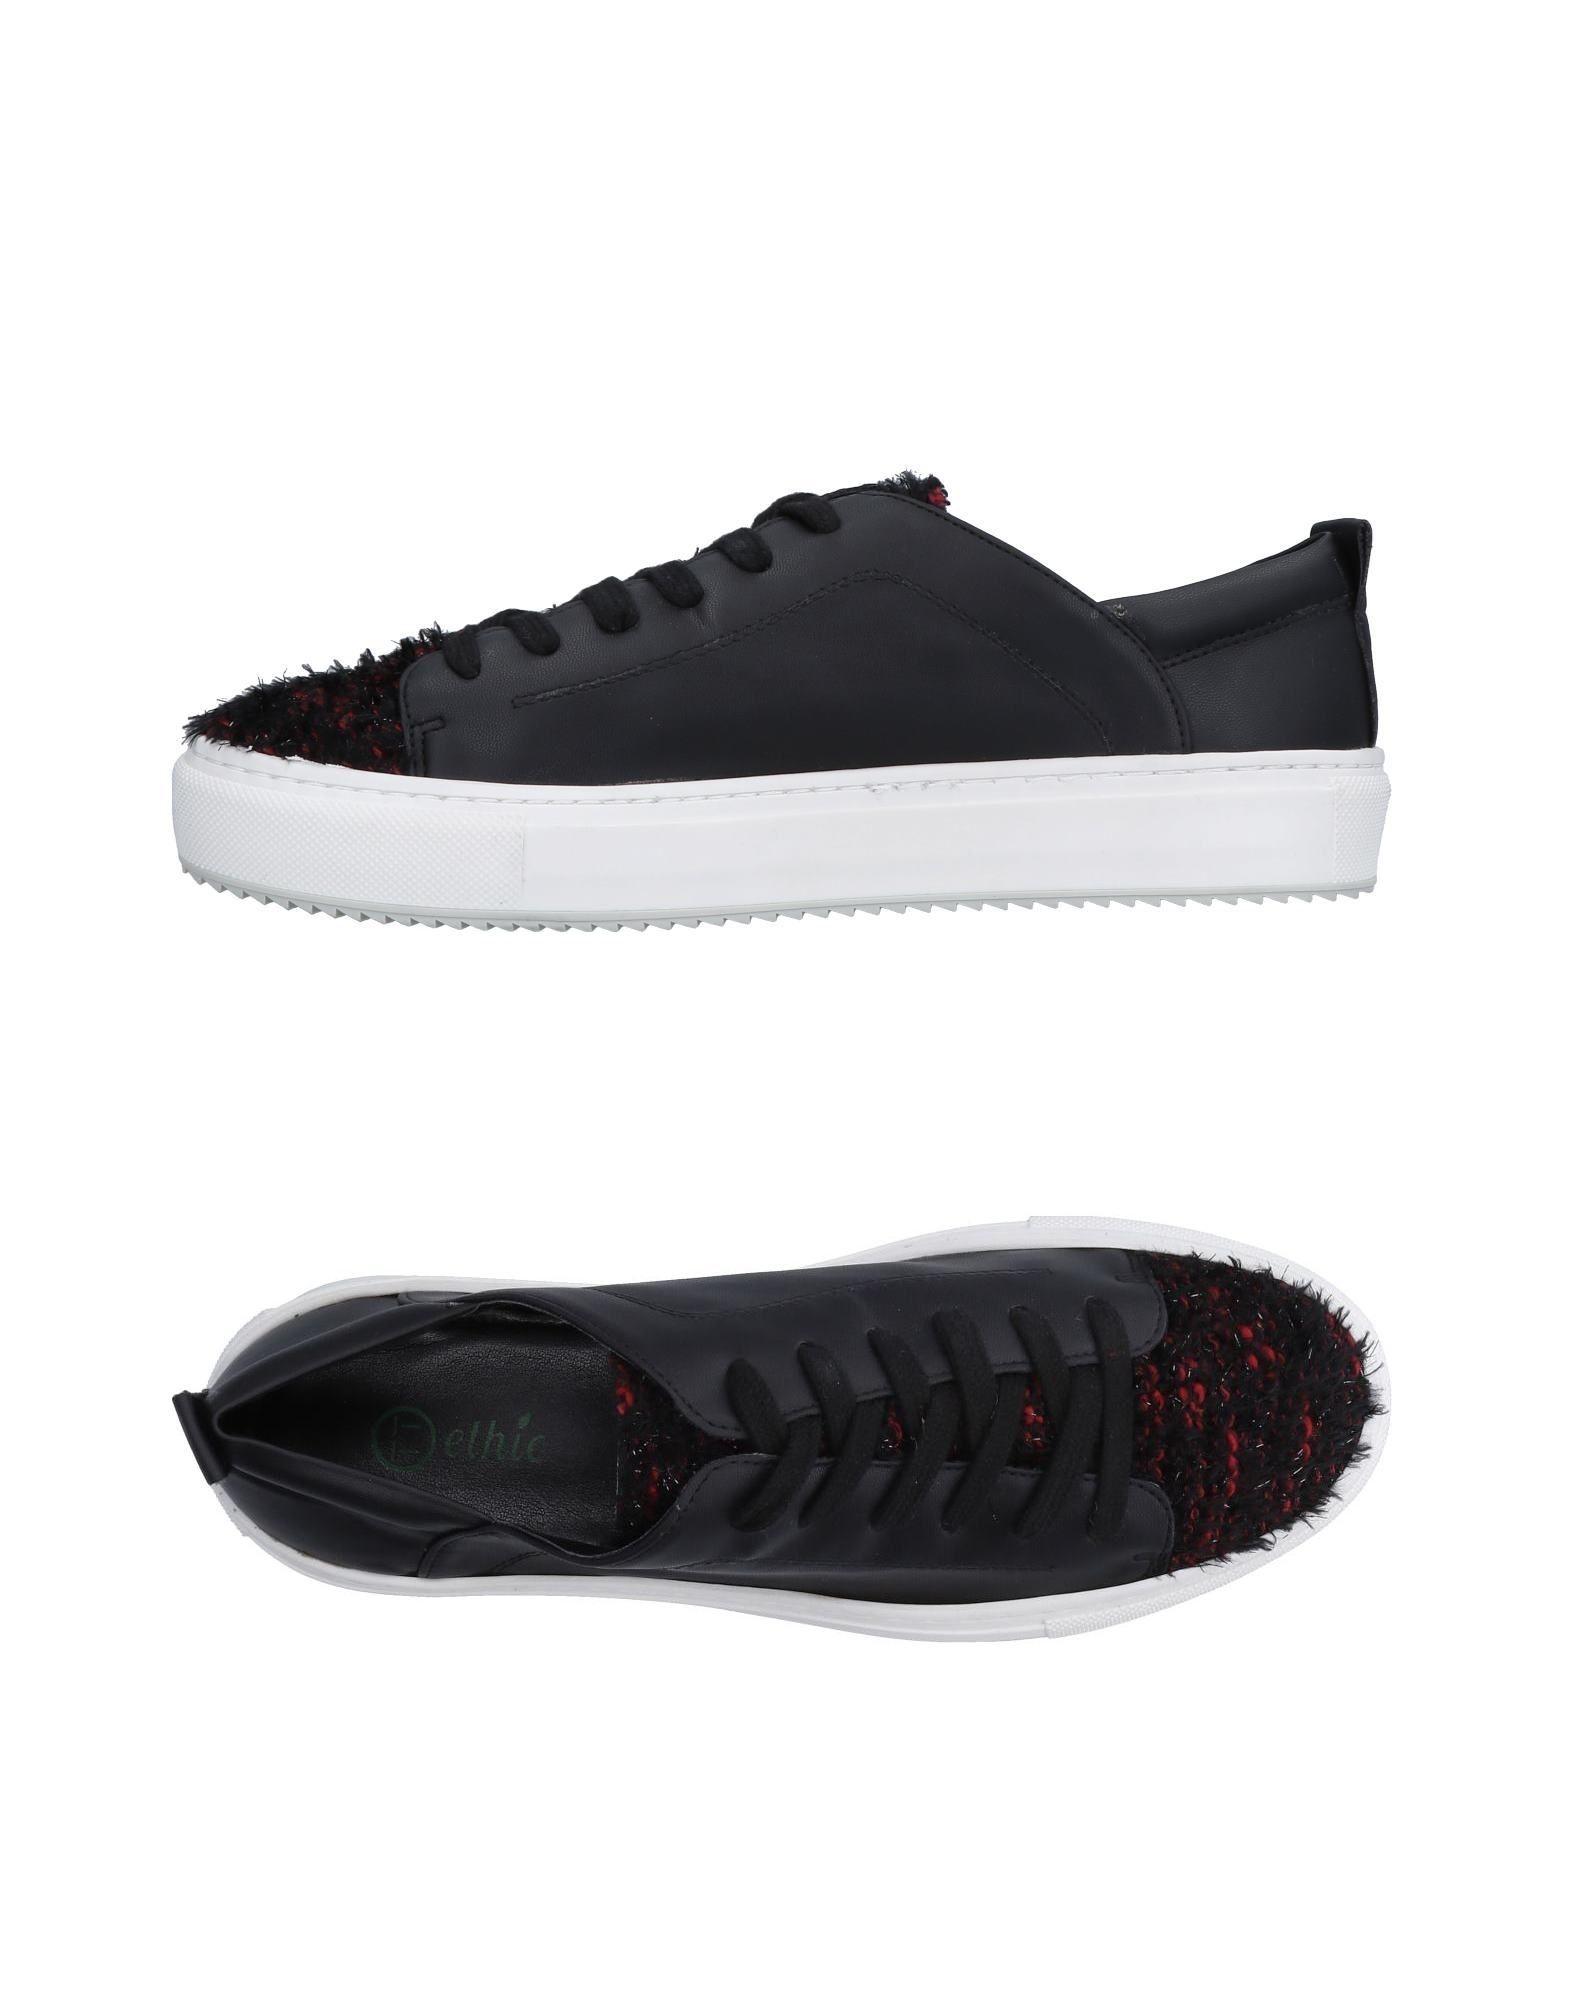 Bagatt Sneakers Damen  11518700GJ 11518700GJ 11518700GJ Gute Qualität beliebte Schuhe a6ec93